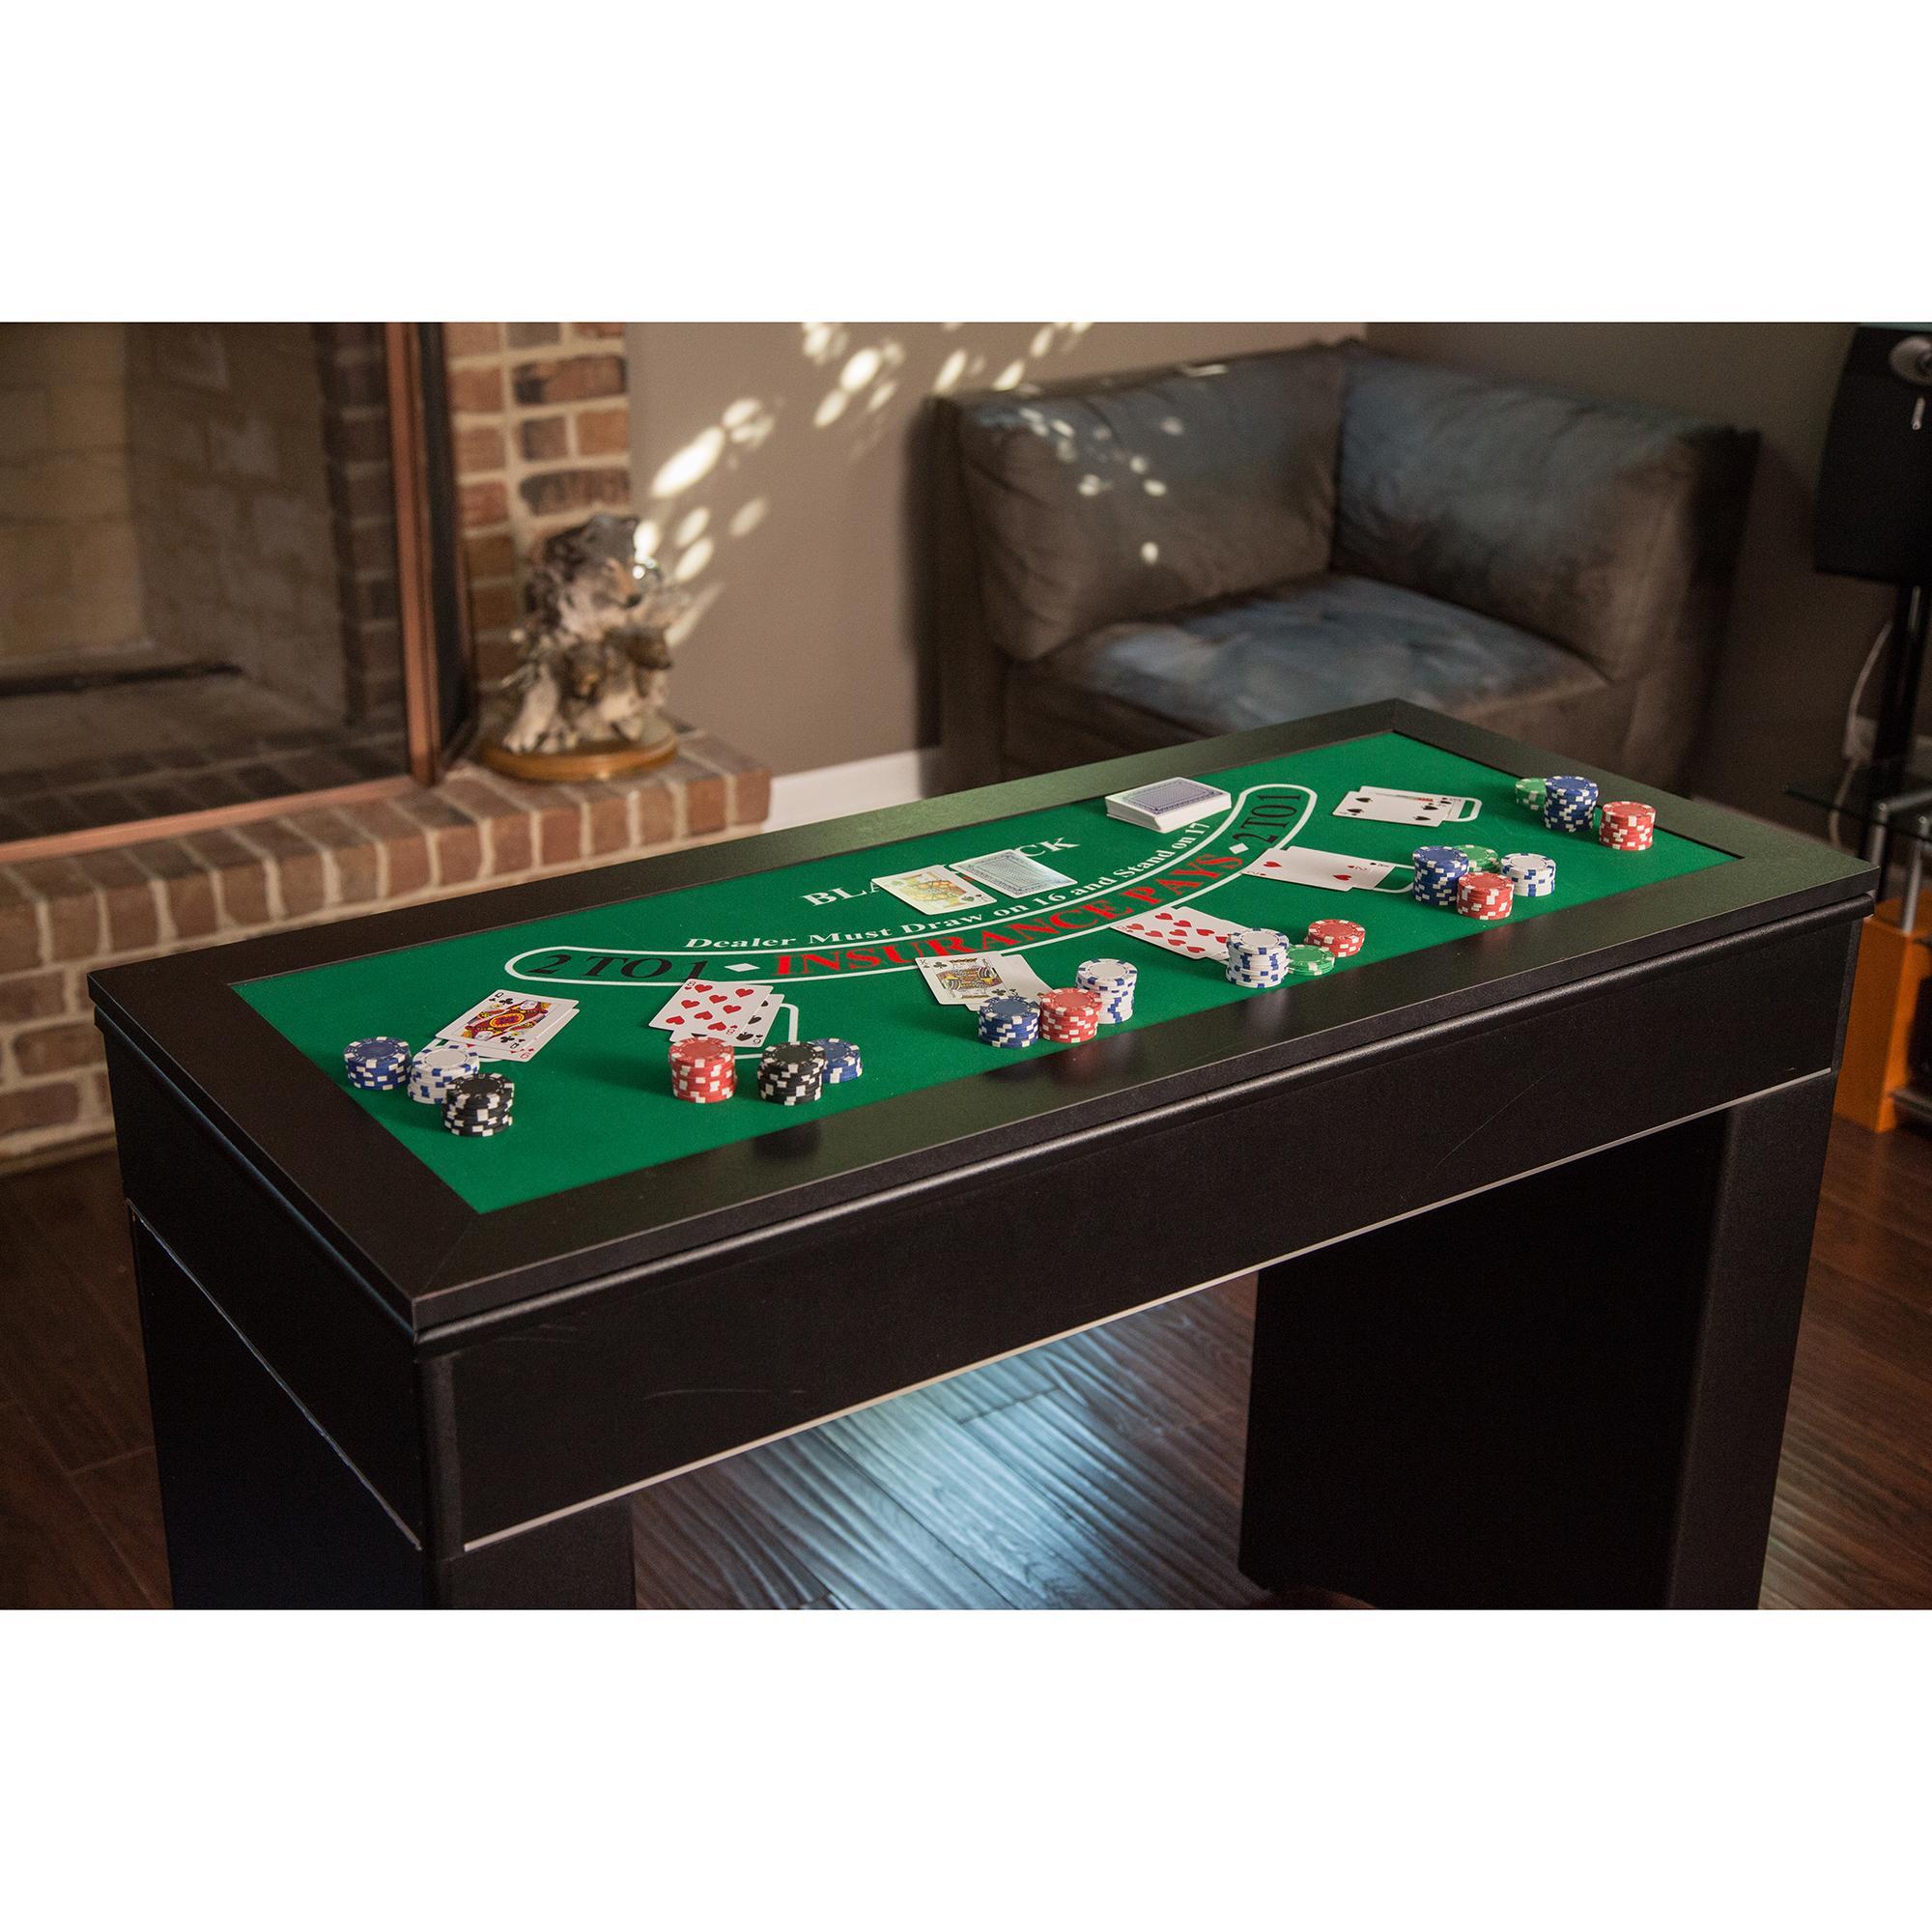 Roulette Casino Poker 4 In 1 Weco